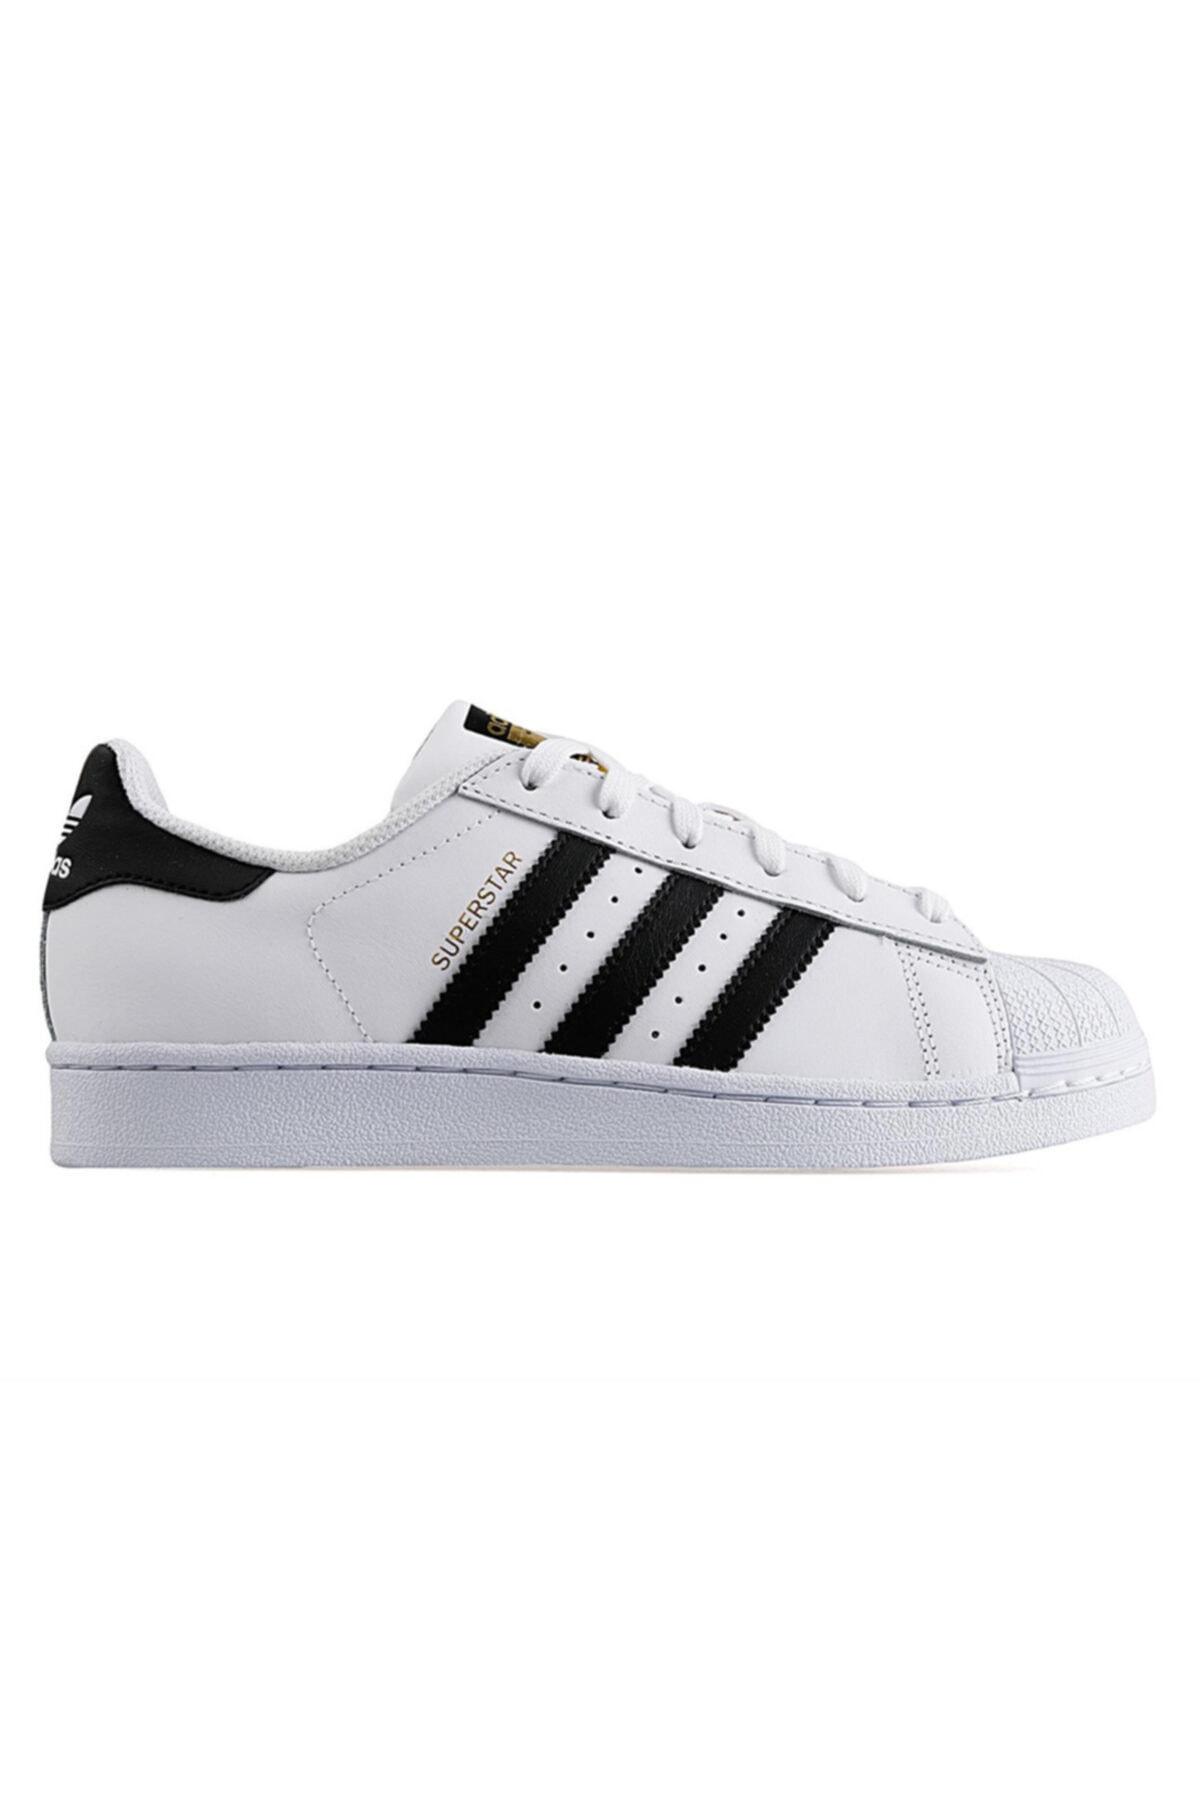 adidas Superstar Orginals Erkek Spor Ayakkabı 2